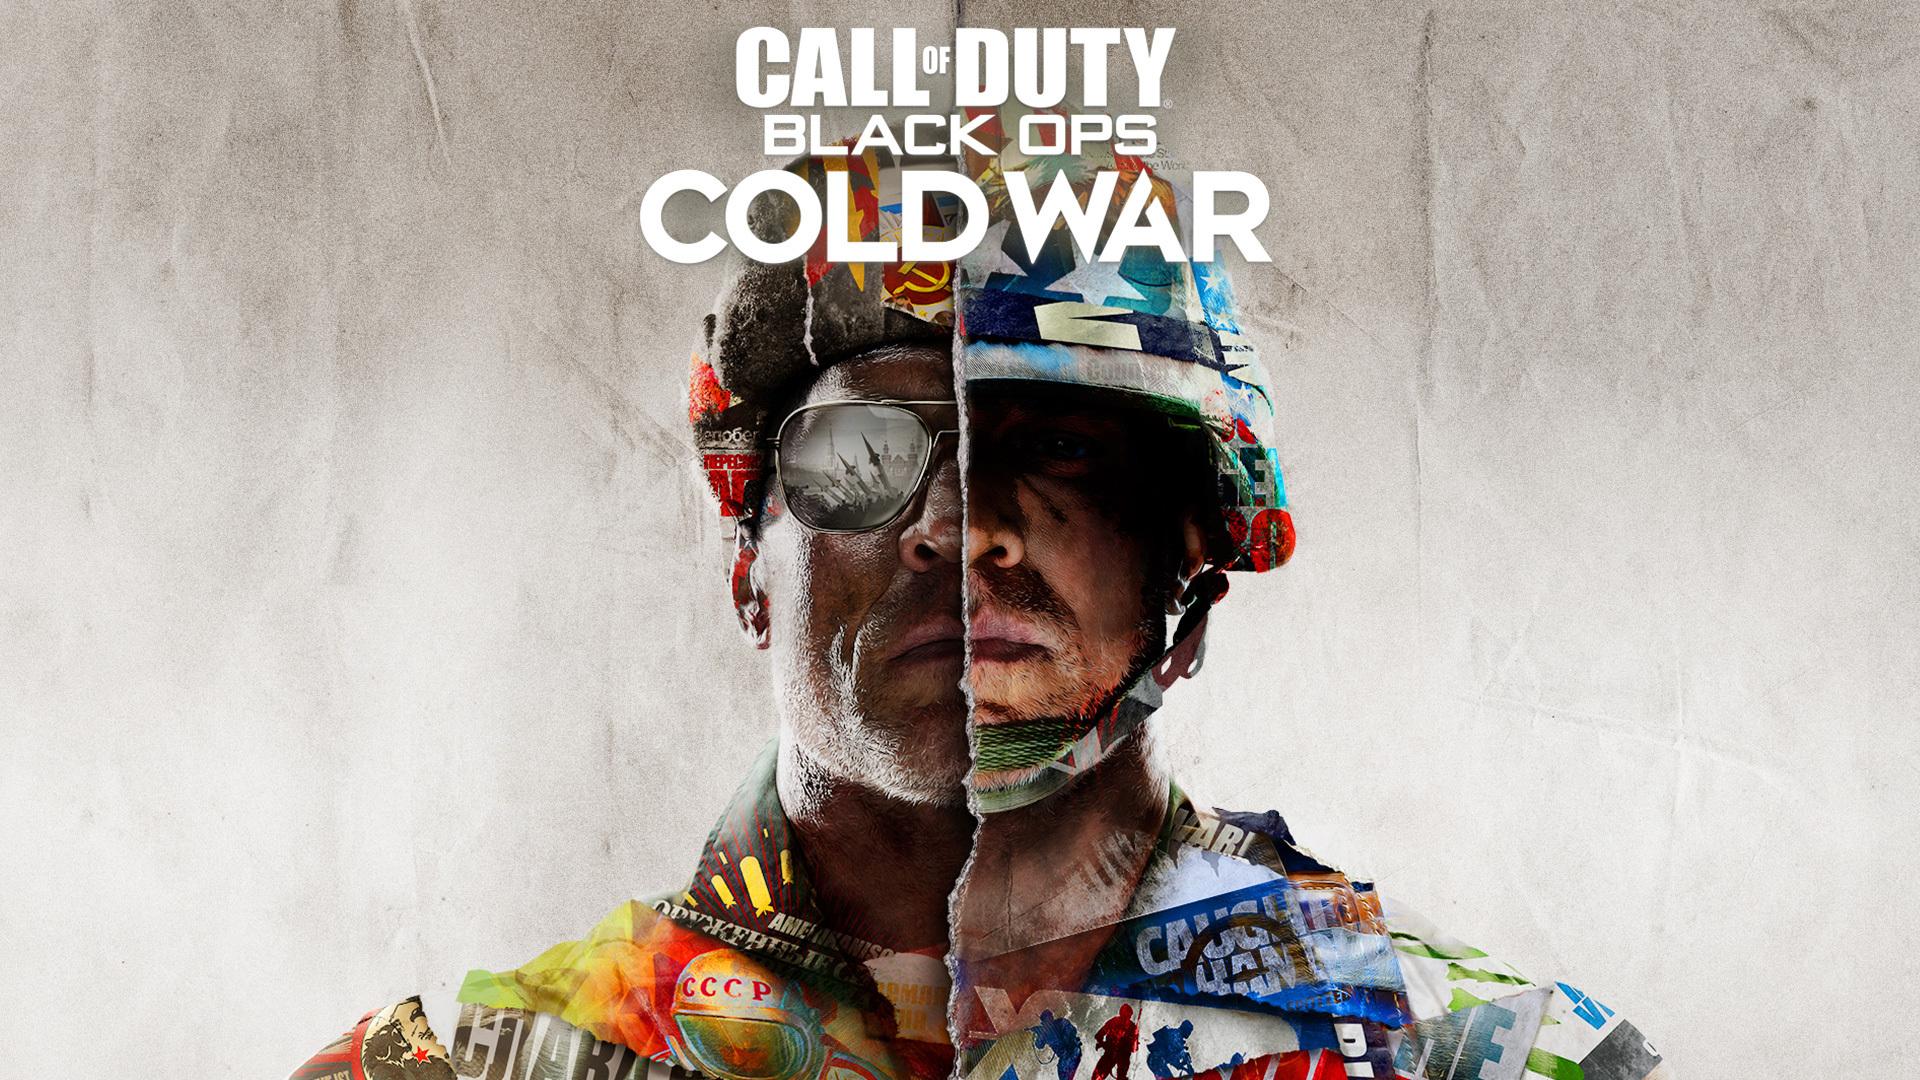 Call of Duty Black Ops: Cold War [PS4] £41.68 (OR PS4 + PS5 Cross-Gen Bundle £51.72) Pre Order @ PlayStation Network US via Eneba